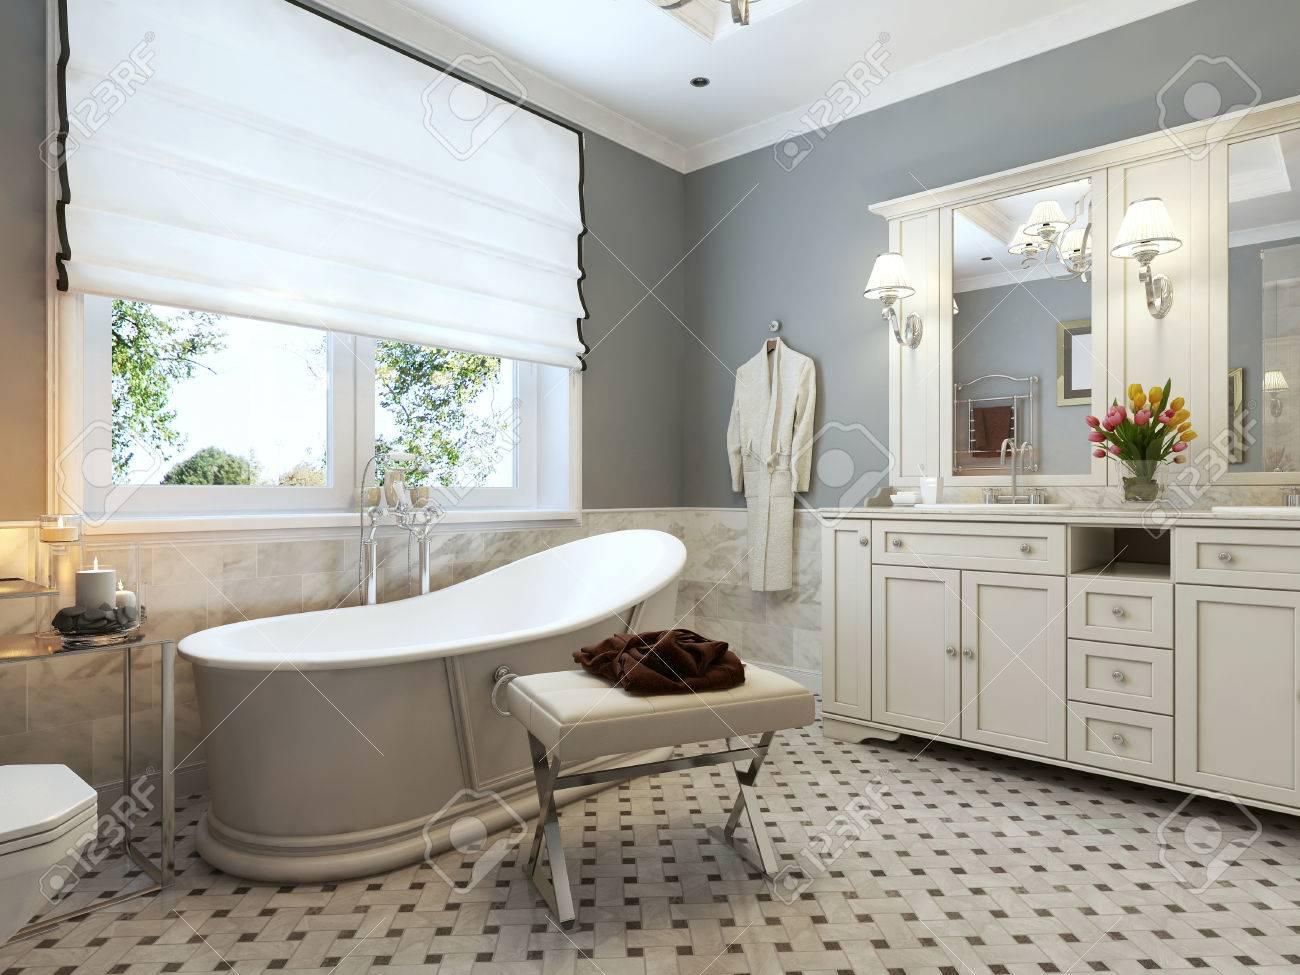 bathroom classic design. Bright Bathroom Classic Design. 3d Render Stock Photo - 47273569 Design O